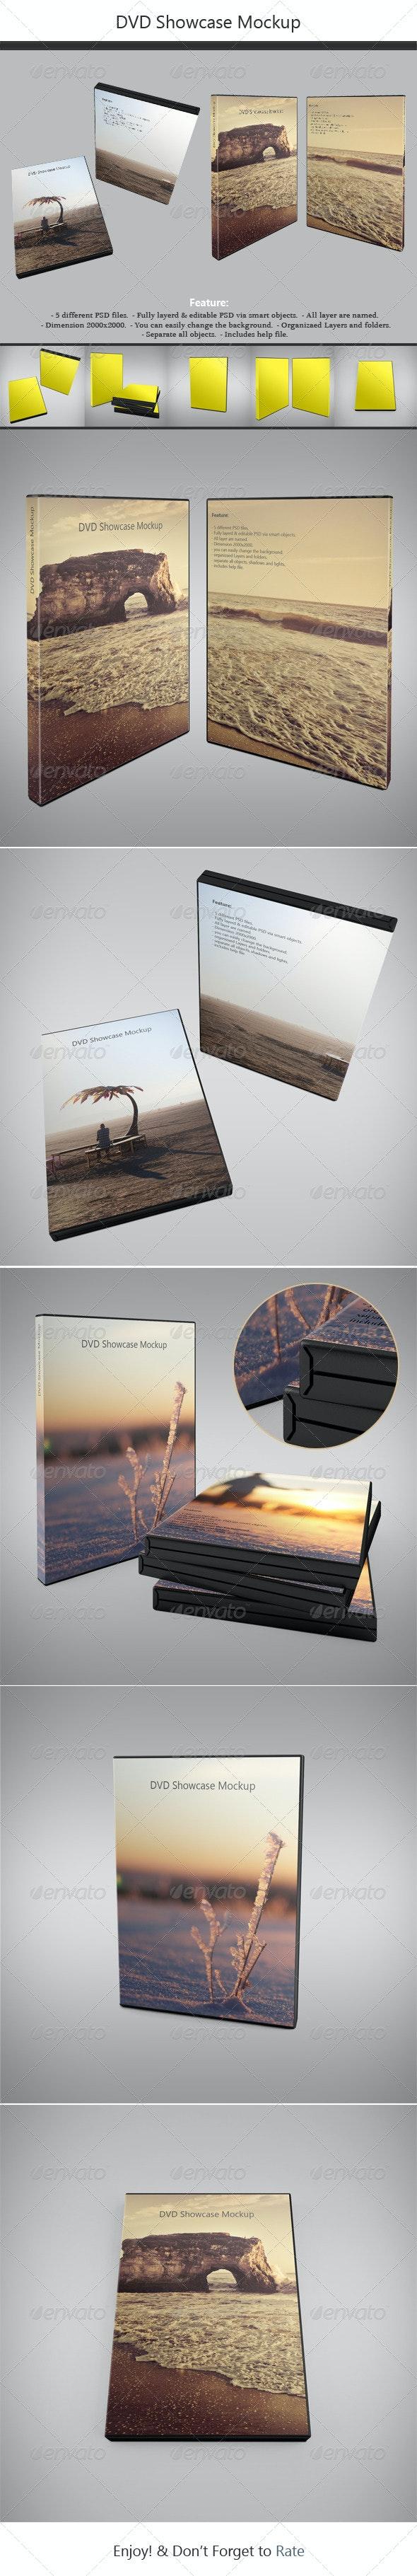 DVD Showcase Mock-up - Discs Packaging